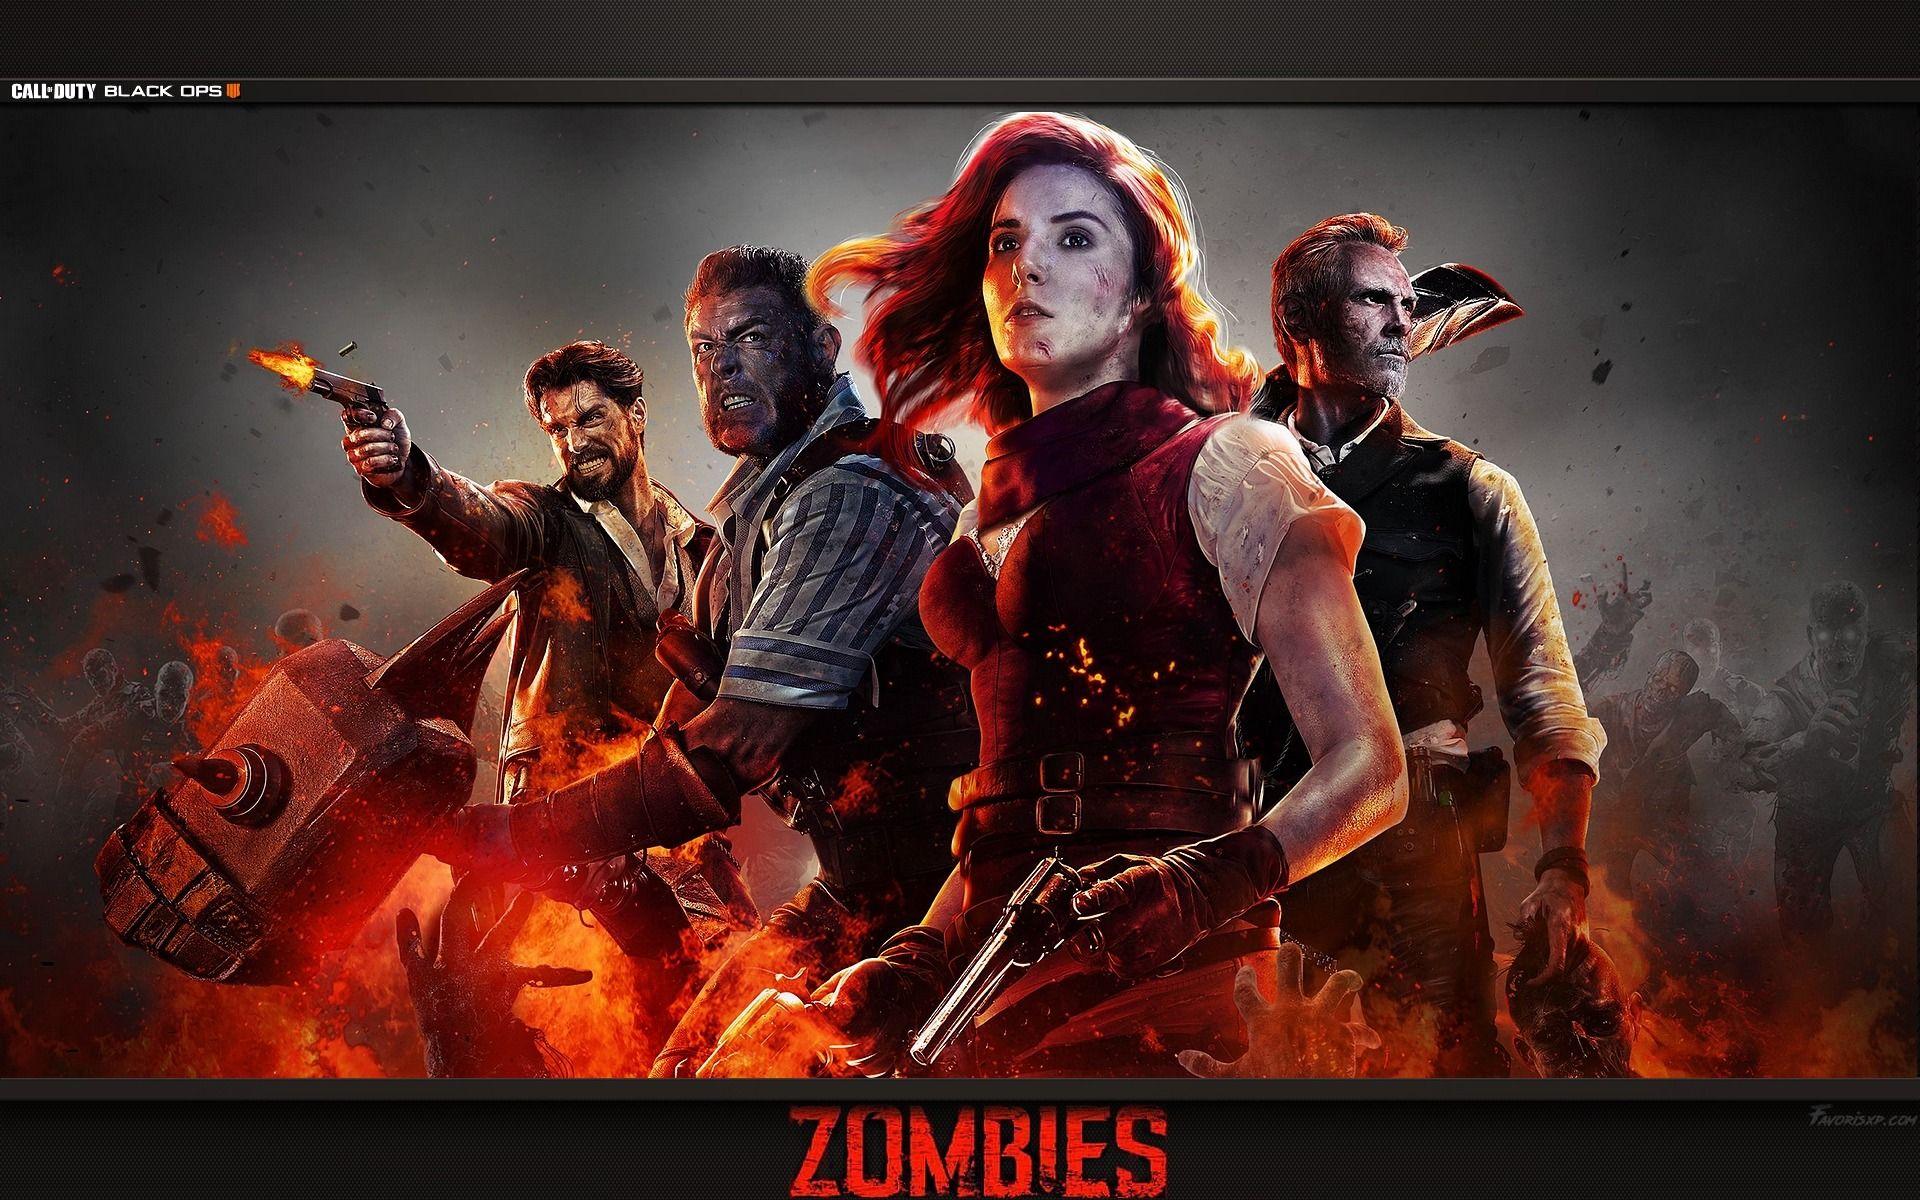 Bo4 Call Of Duty Black Ops 4 Fonds D Ecran Hd Gratuits Pour Pc Black Ops Call Of Duty Black Wallpaper Iphone Disney Princess